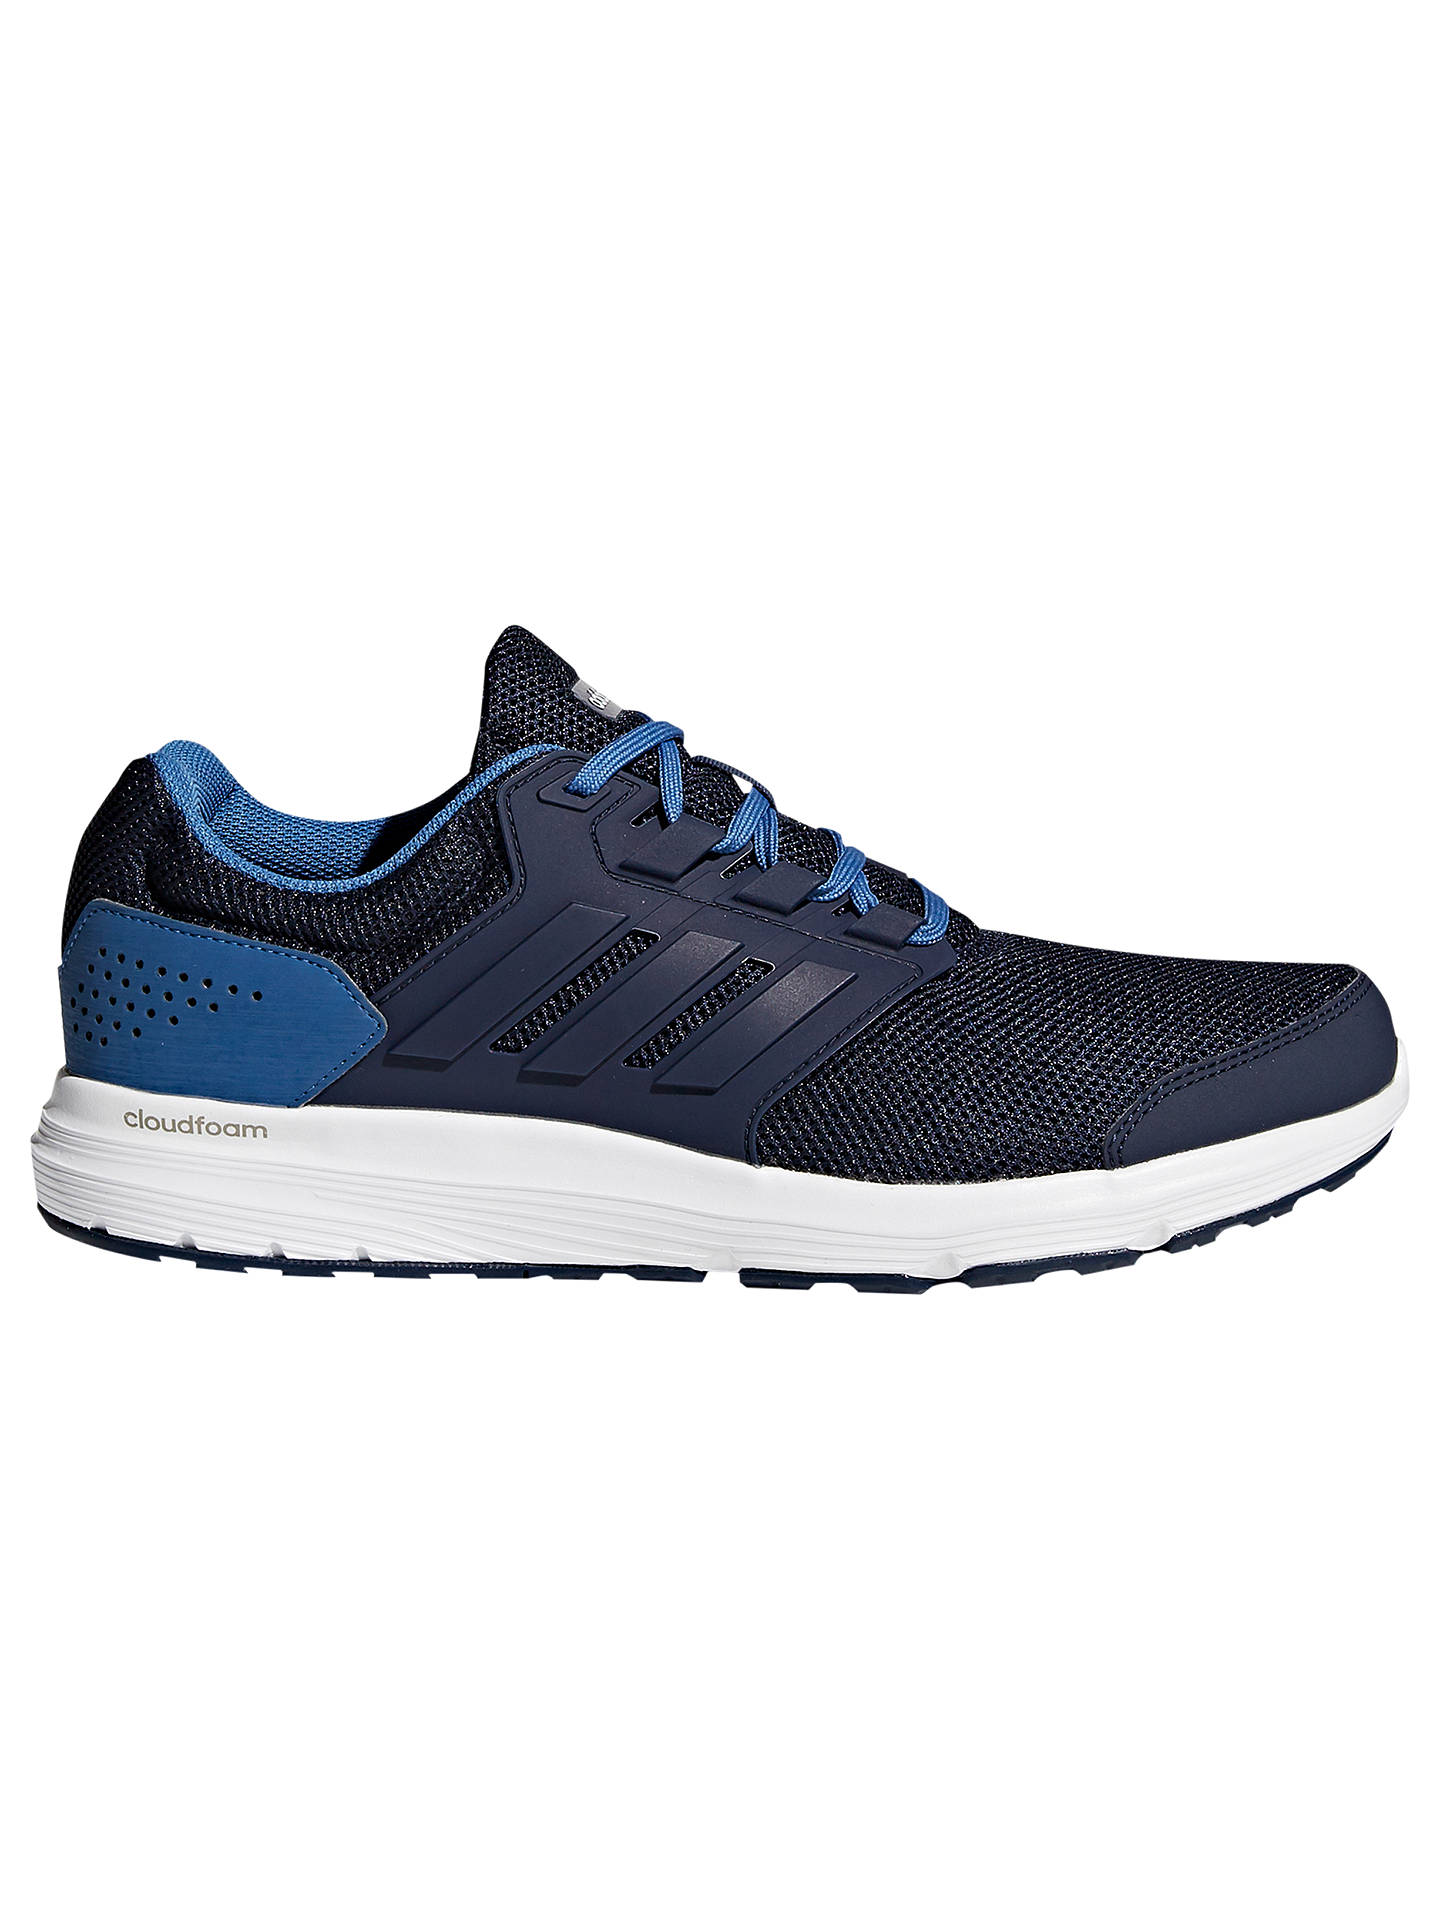 ad90b5045 adidas Galaxy 4 Men s Running Shoes at John Lewis   Partners